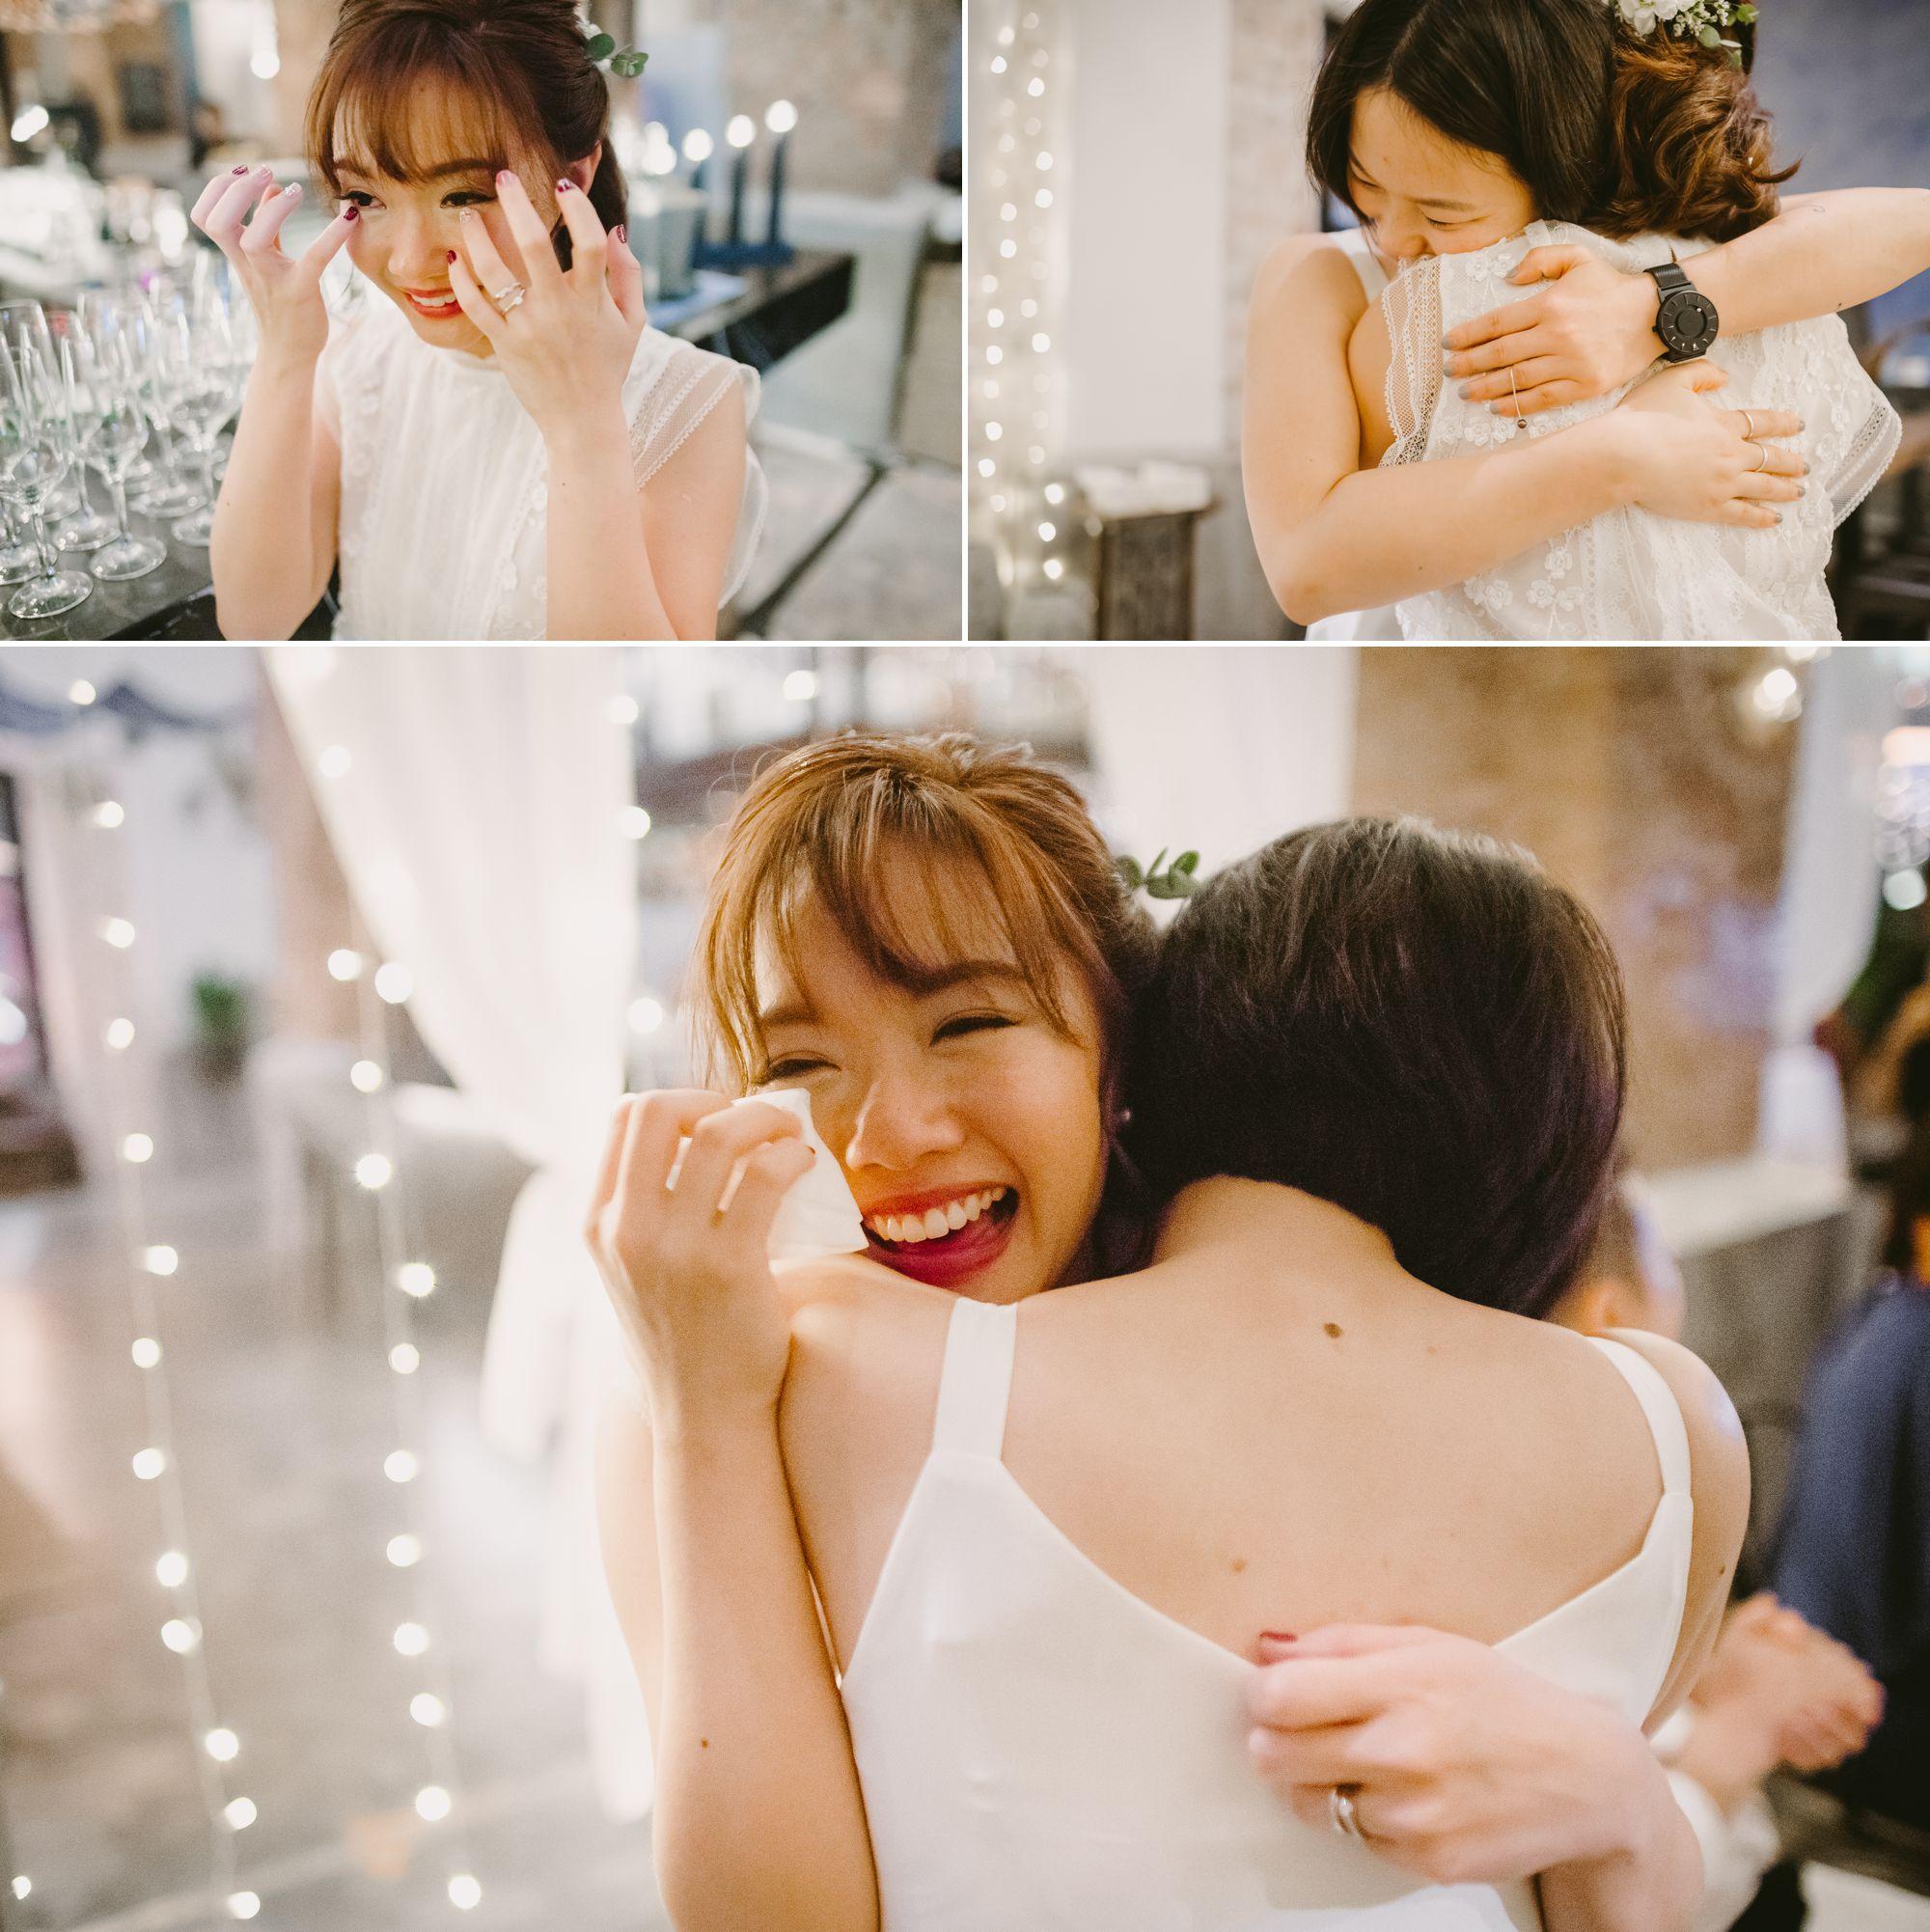 wedding_photography 34.jpg